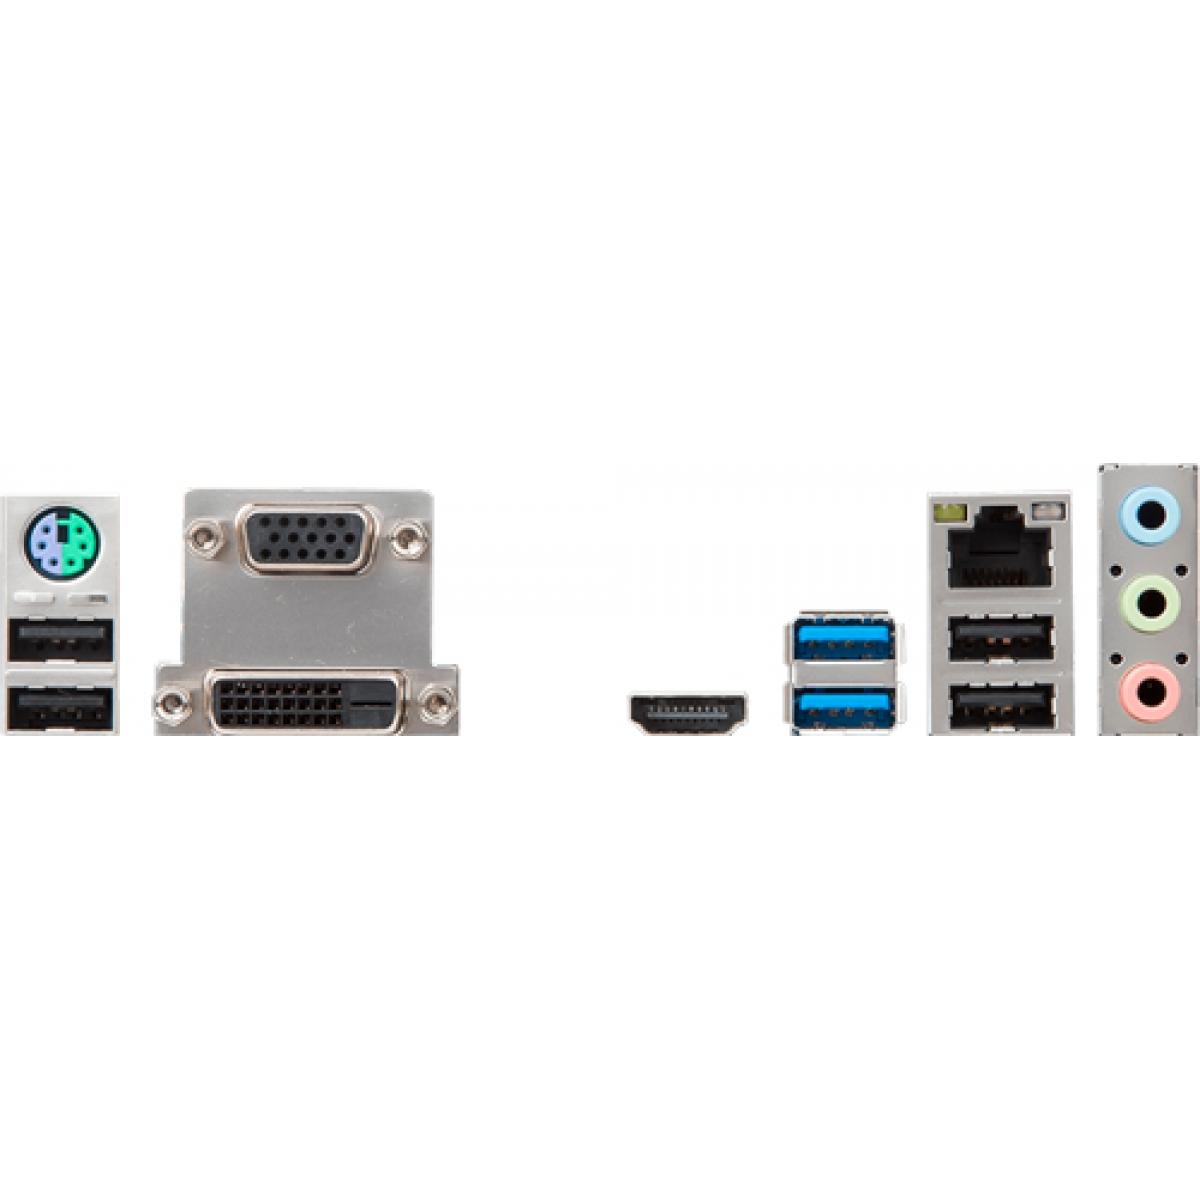 Placa Mãe MSI H310M PRO-M2, Chipset H310, Intel LGA 1151, mATX, DDR4